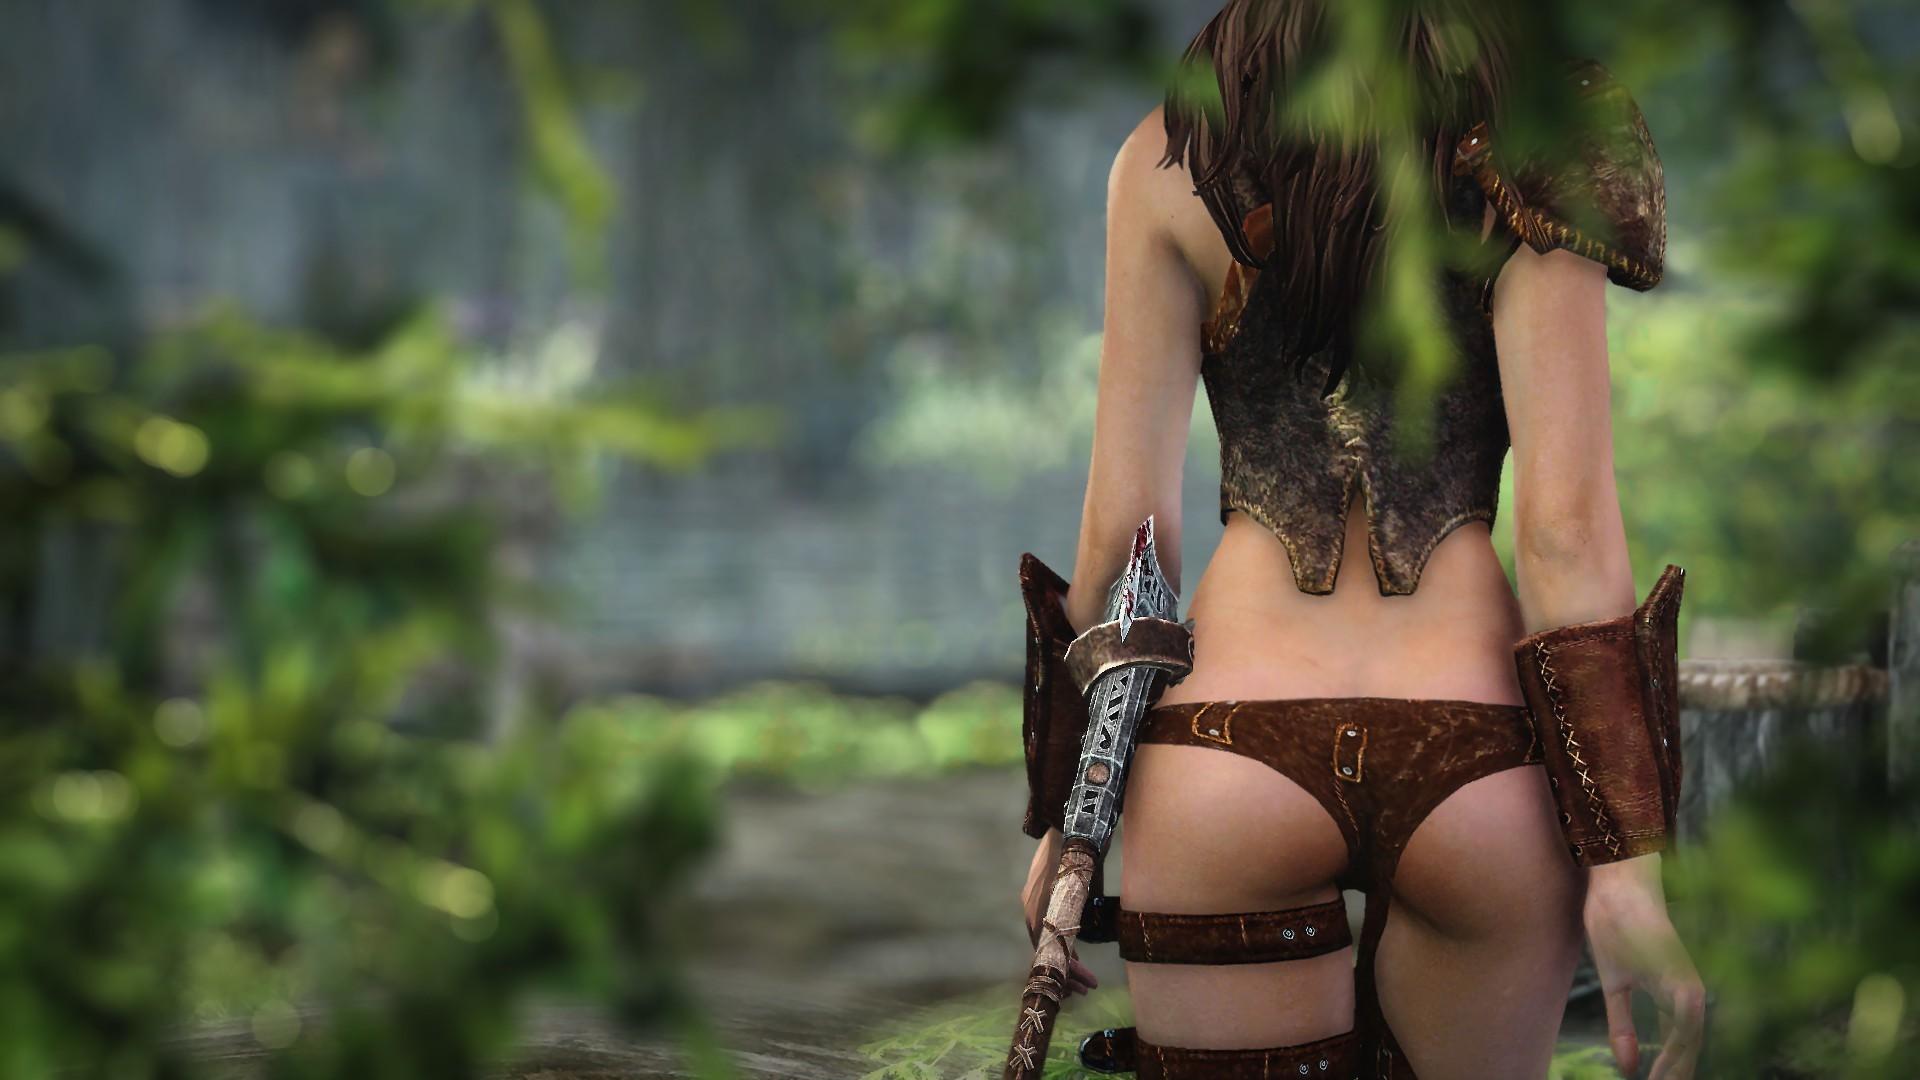 Skyrim Remastered Release Date Pc. Skyrim Remaster Release